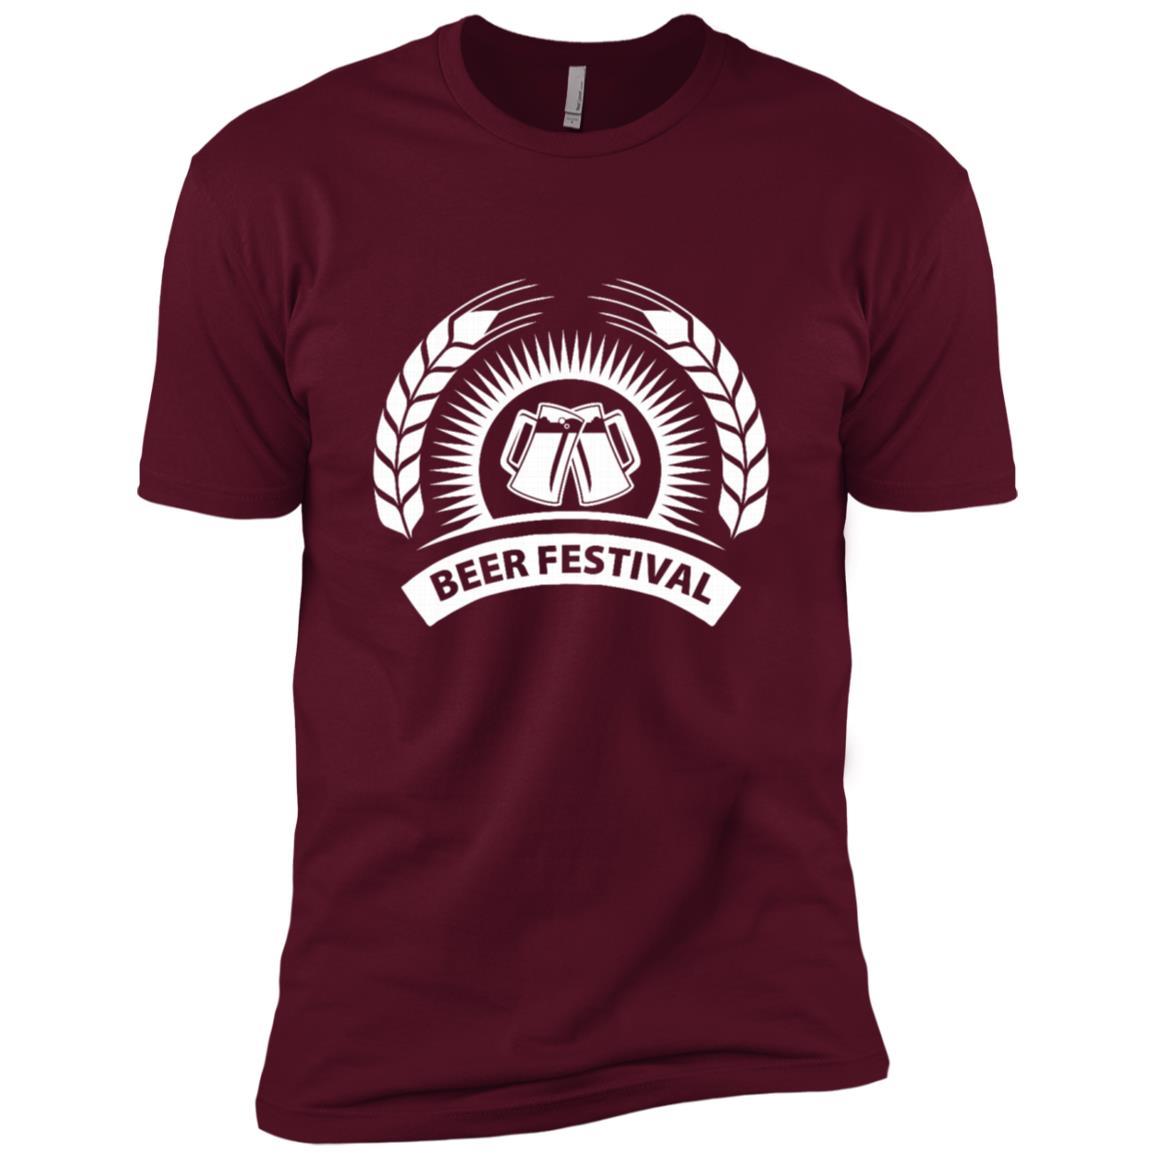 Beer Festival Fan Funny Alcohol Drink Lover Gift Men Short Sleeve T-Shirt